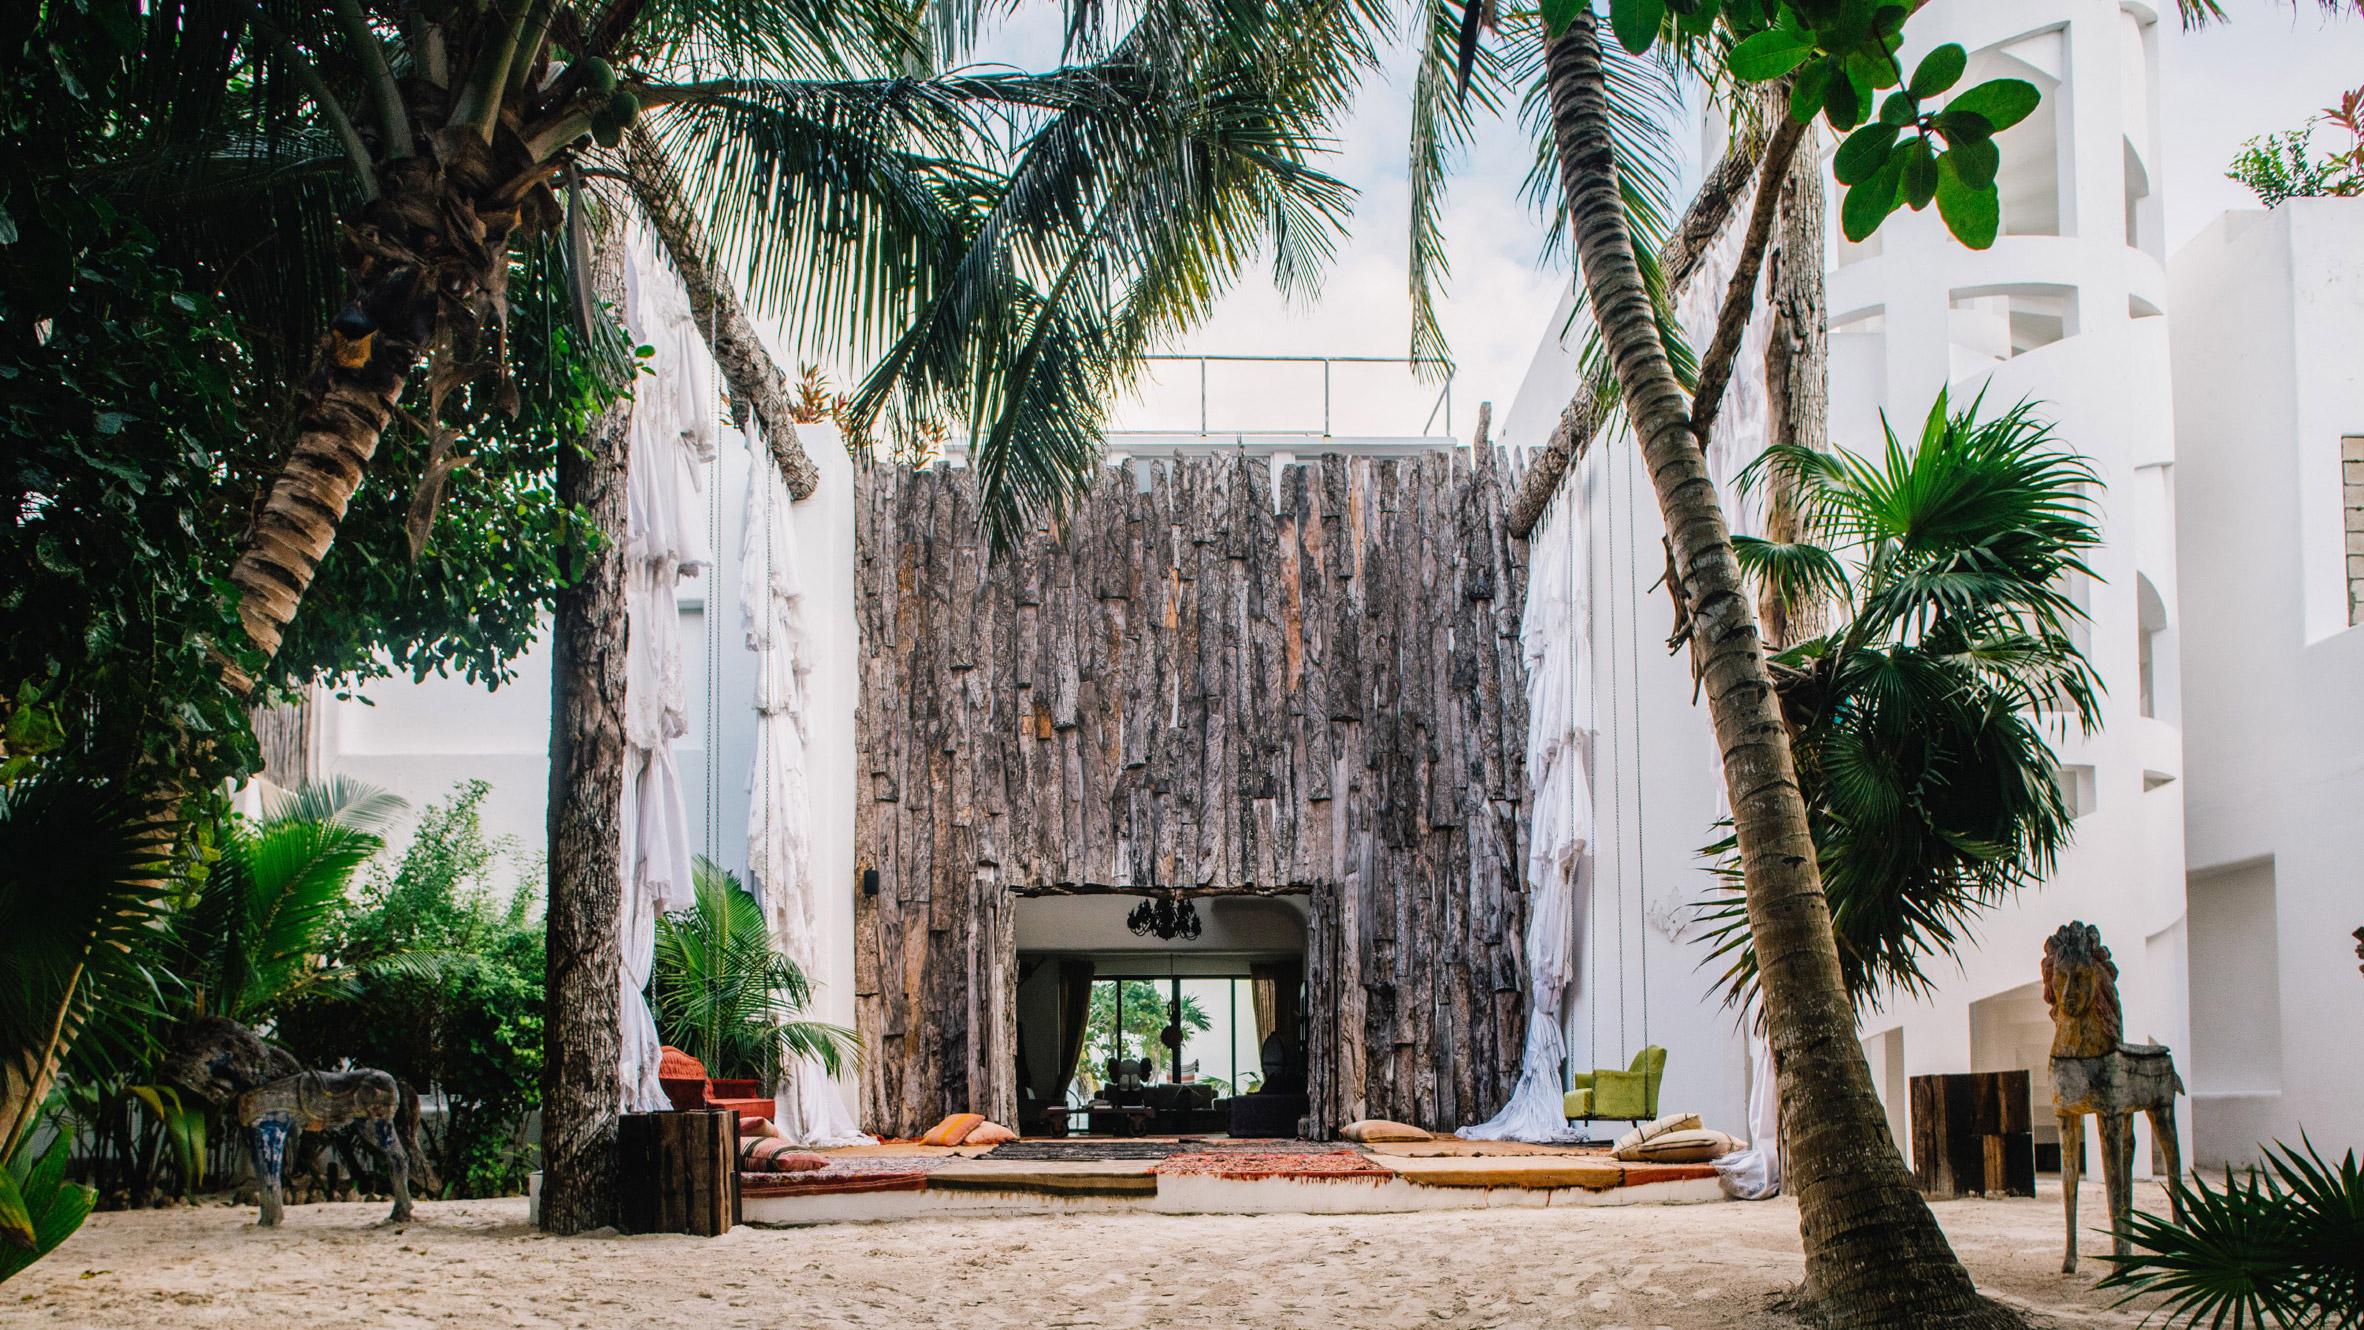 casa-malca-architecture-hotels-mexico_dezeen_hero-a